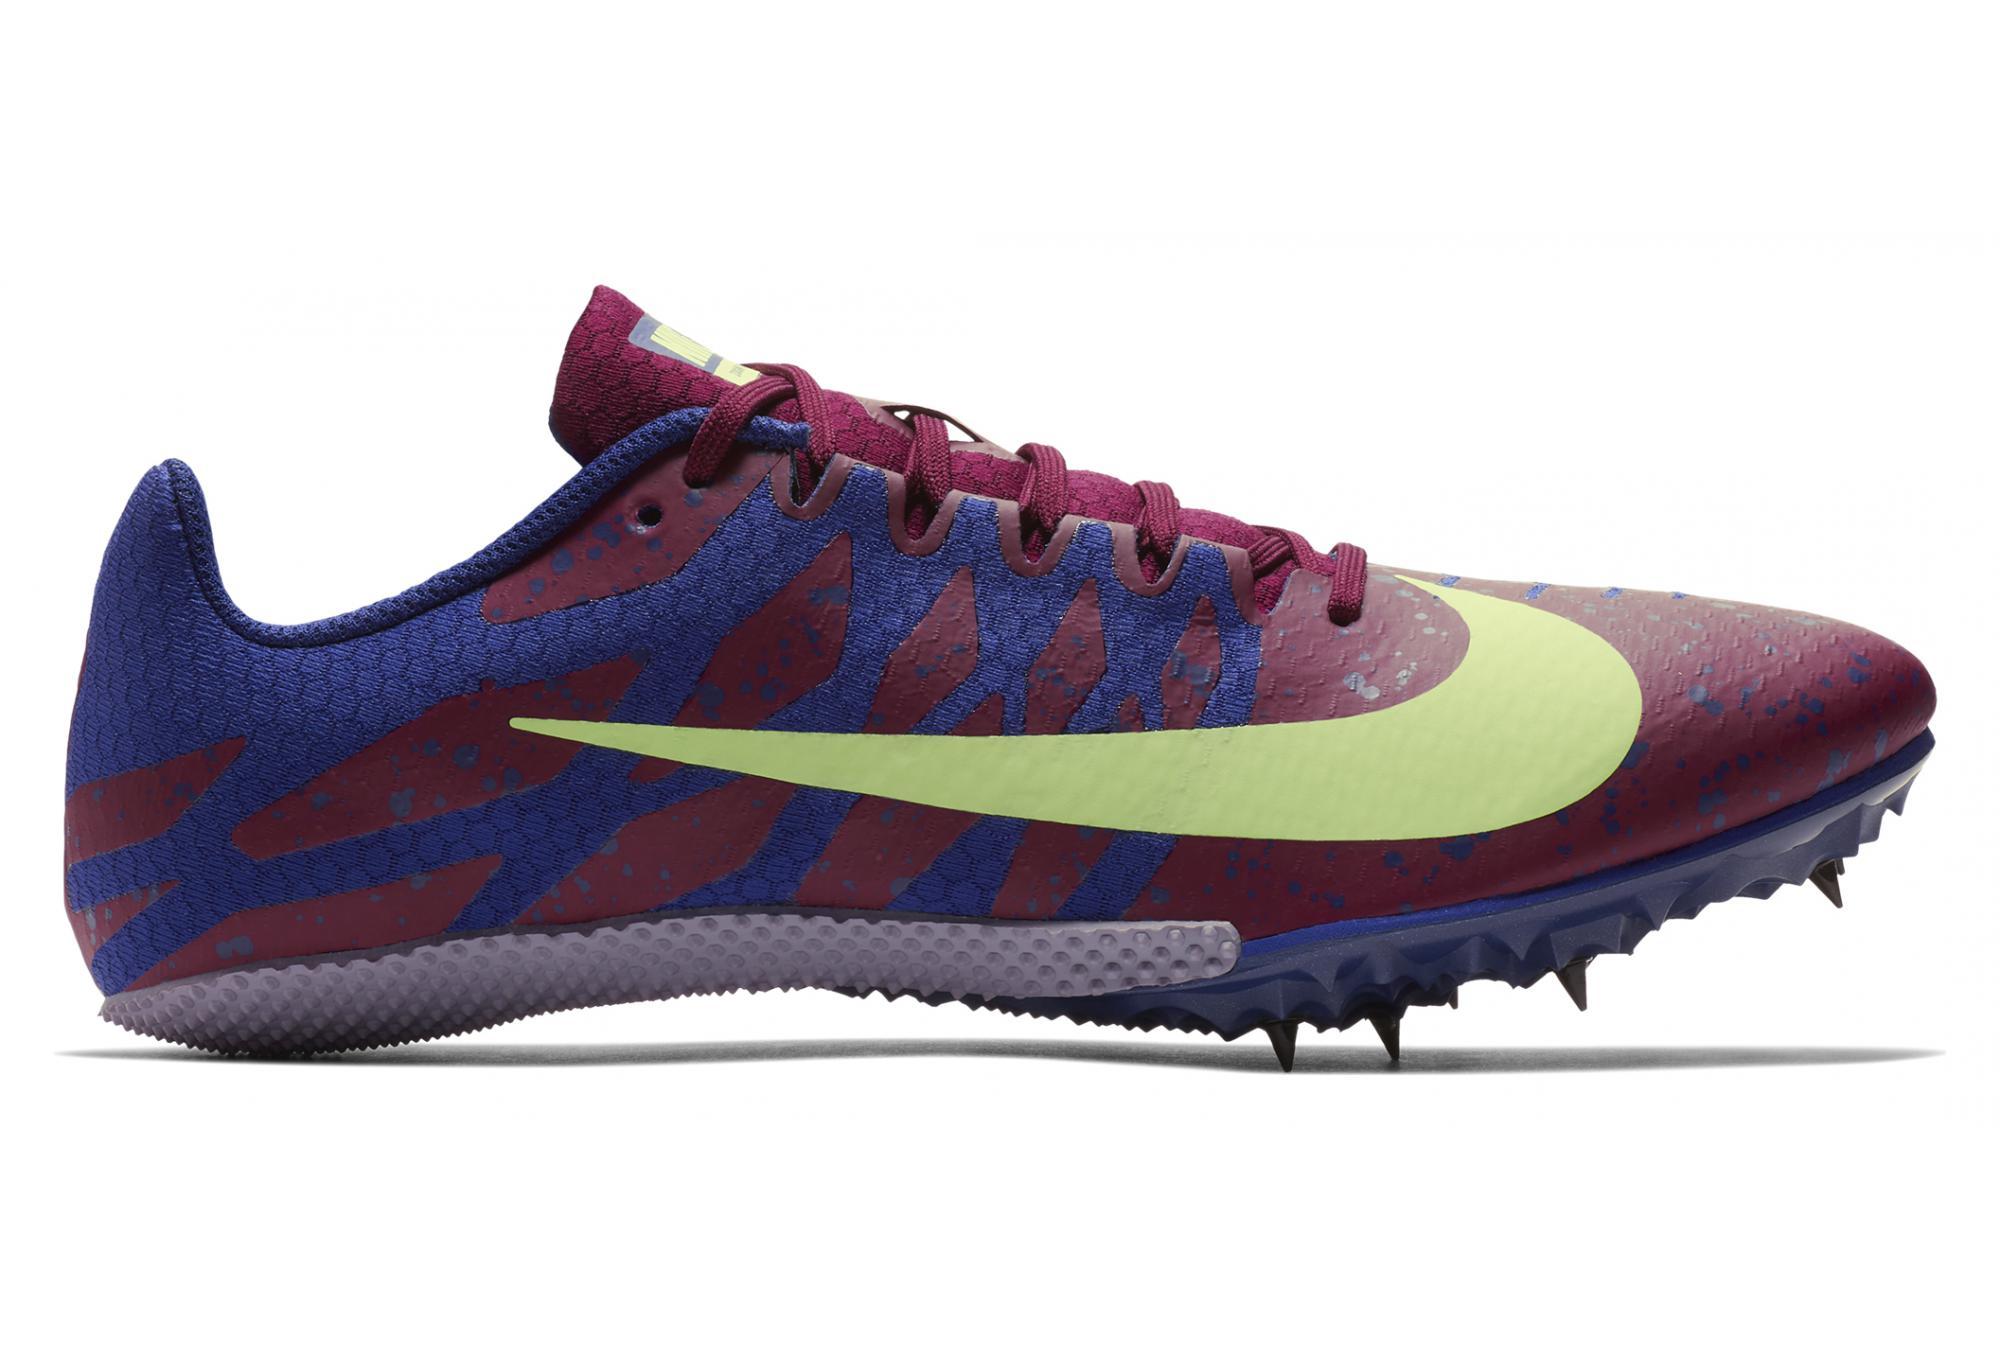 timeless design dbdee 19ced Chaussures d Athlétisme Nike Zoom Rival S 9 Bleu   Rouge